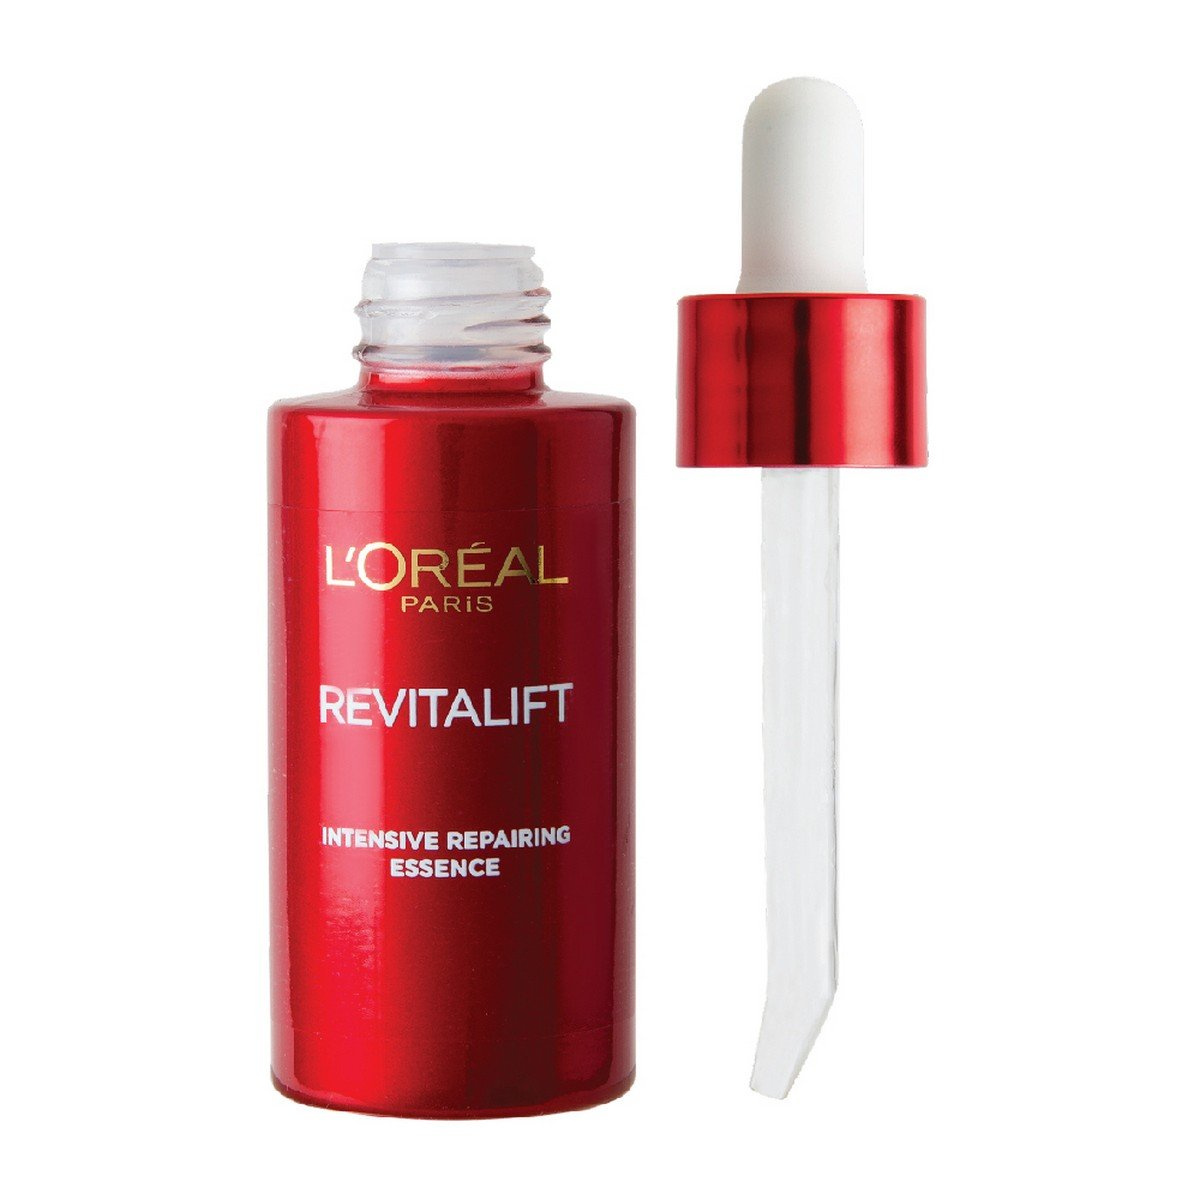 L'Oreal Paris Revitalift Intensive Night Repair Essence Serum ...